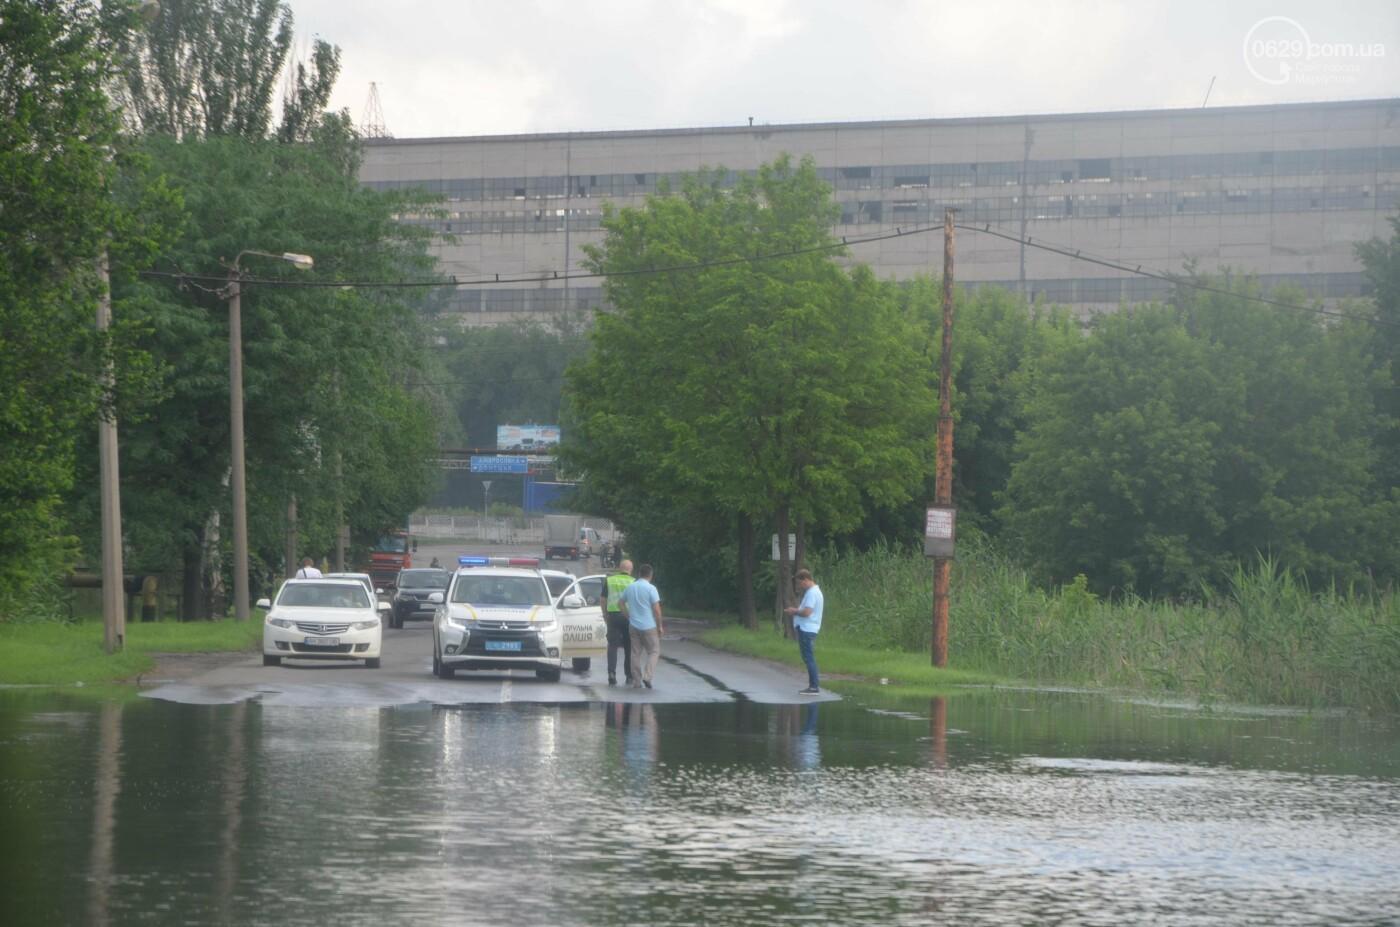 Разлилась река. В Мариуполе затопило дорогу, - ФОТОРЕПОРТАЖ, фото-2